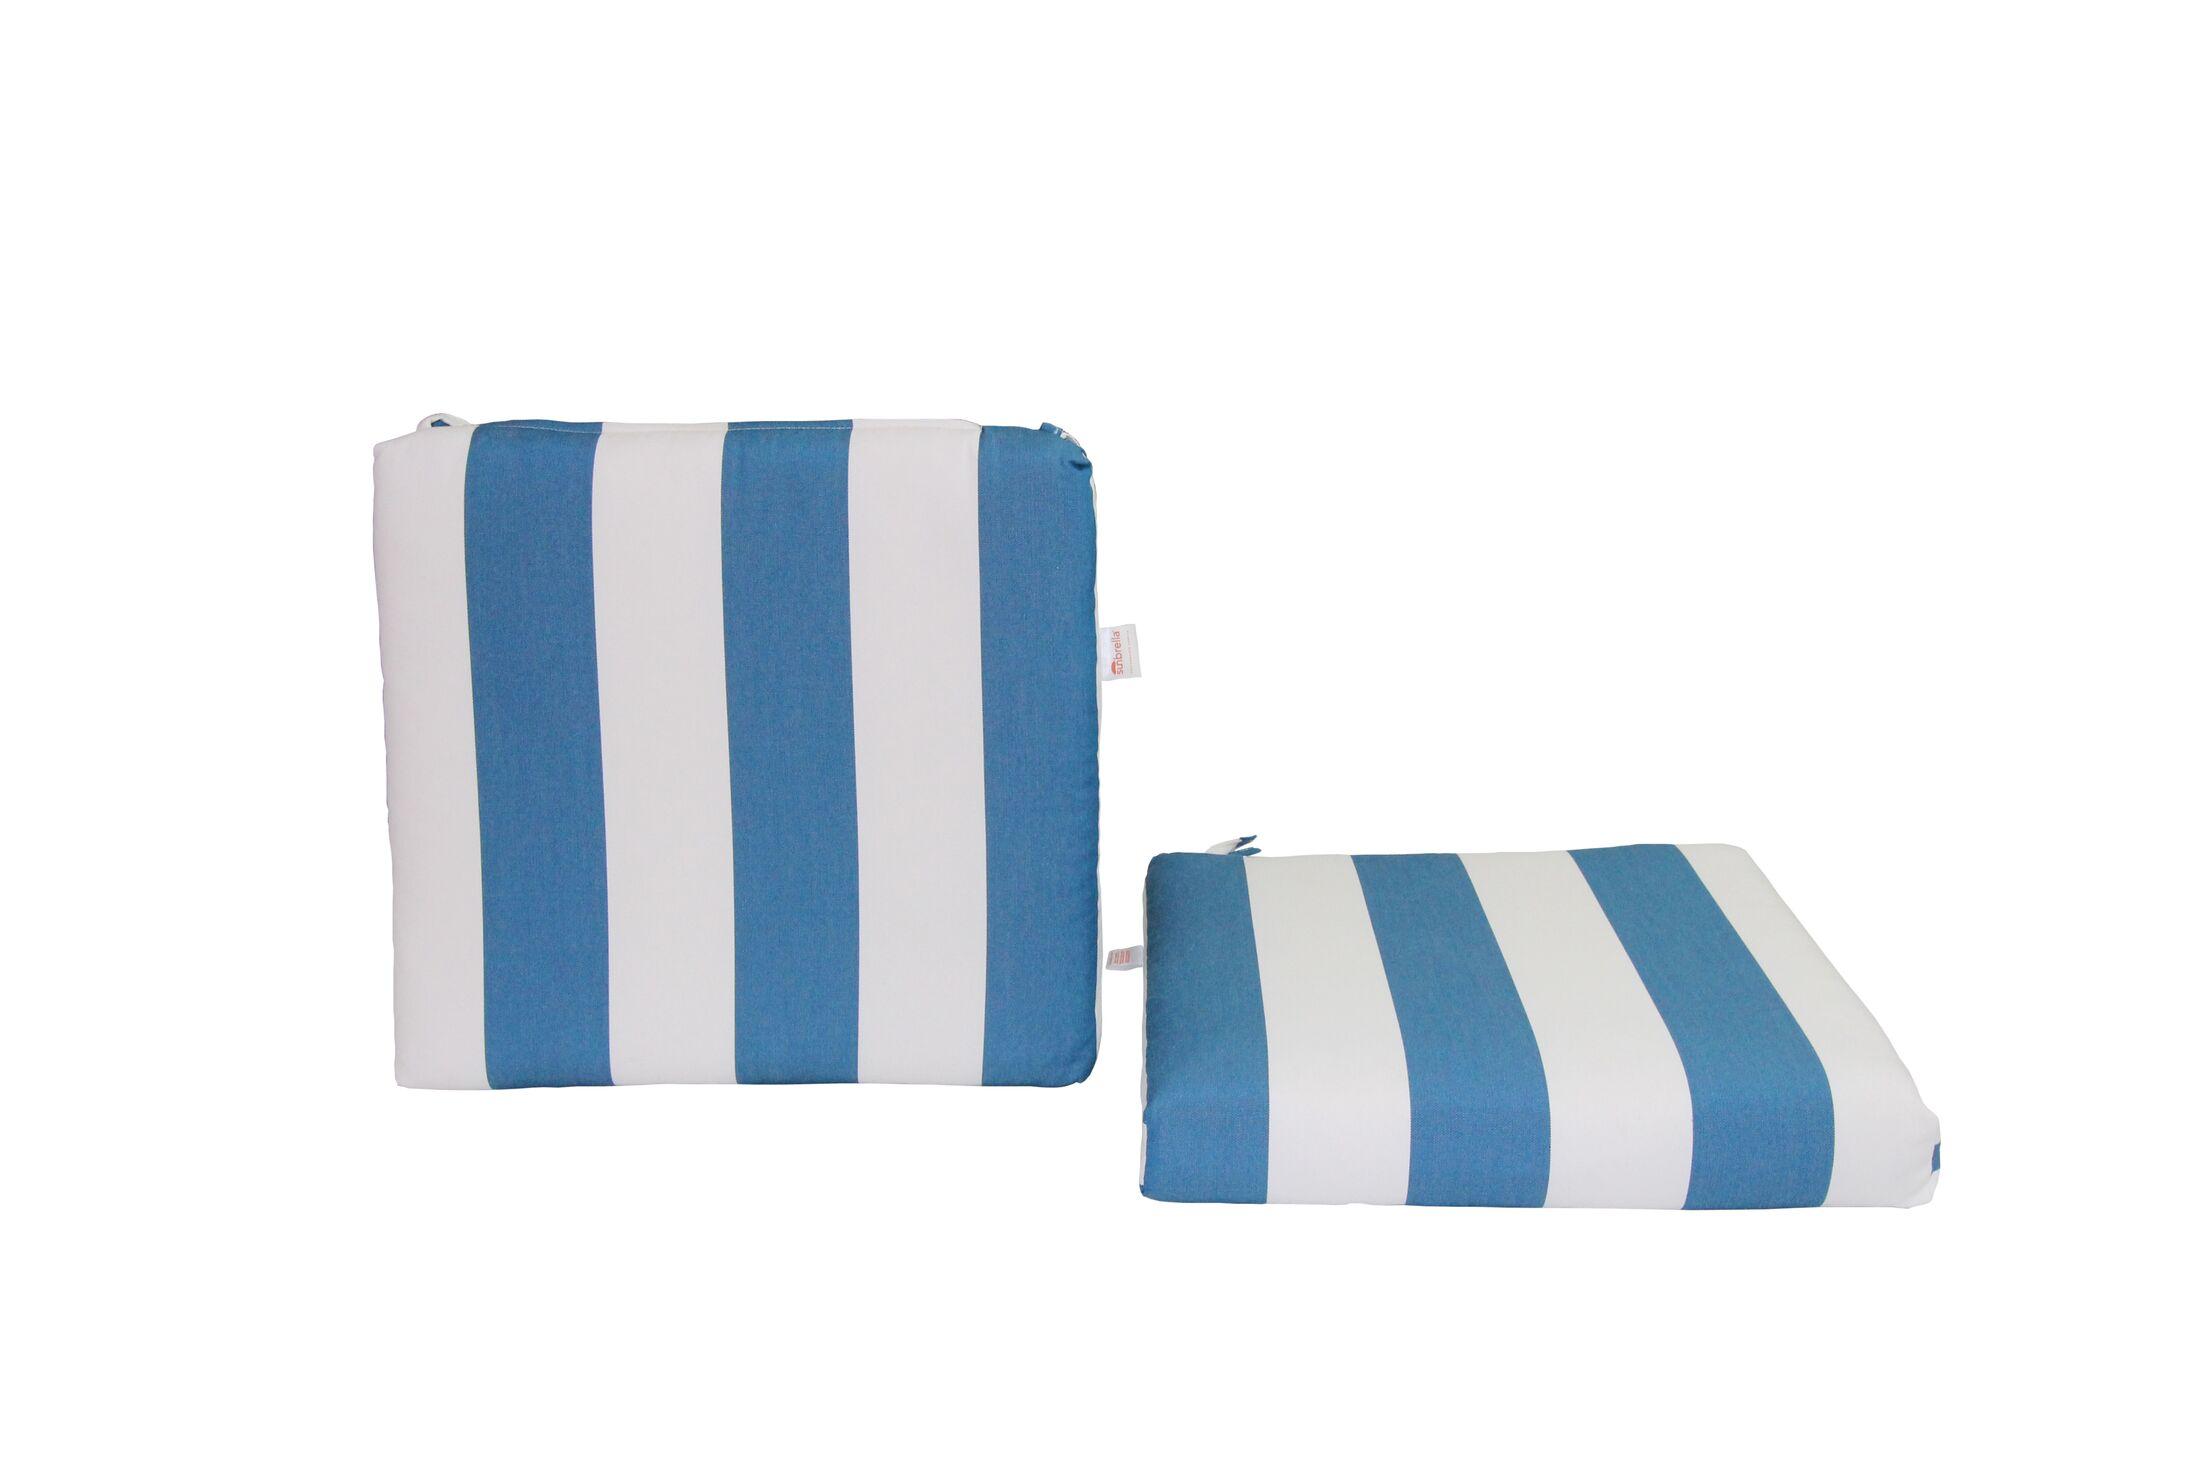 Indoor/Outdoor Sunbrella Dining Chair Cushion Fabric: Cabana Regatta